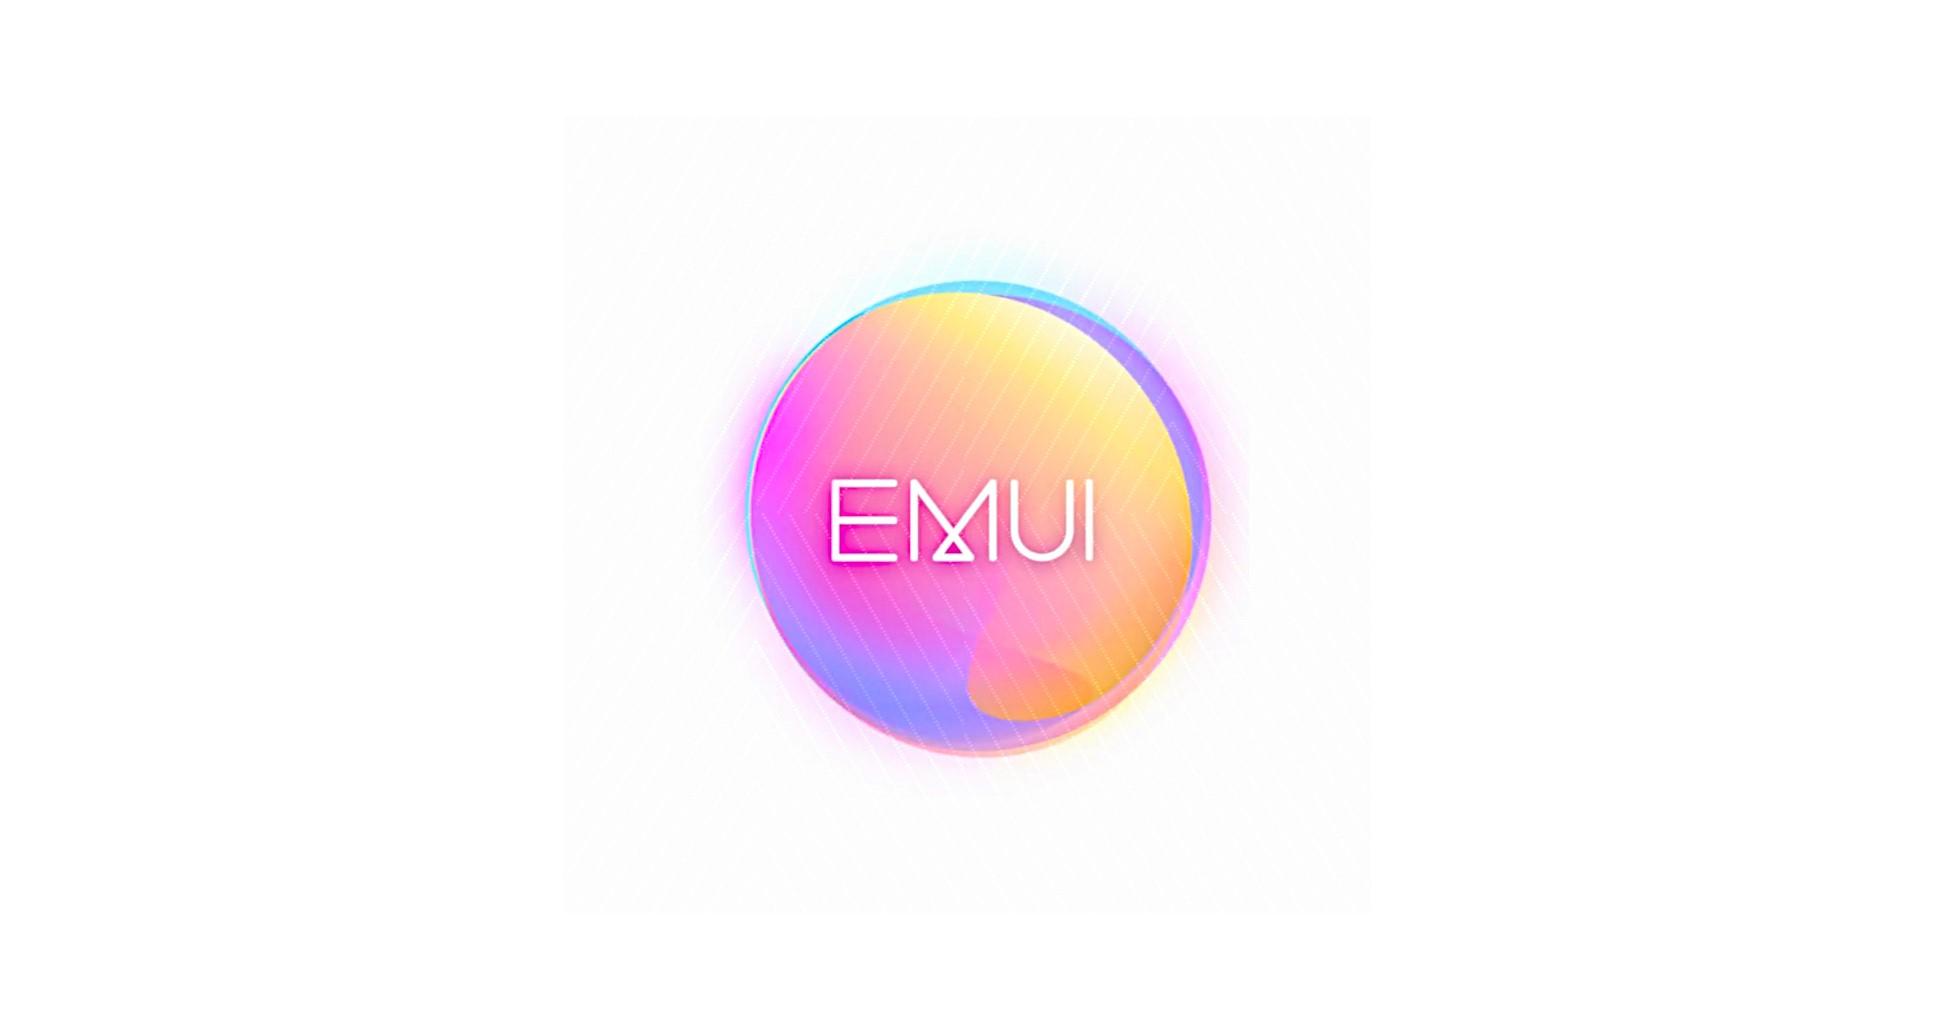 Huawei EMUI 10 založené na Androidu Q se ukazuje